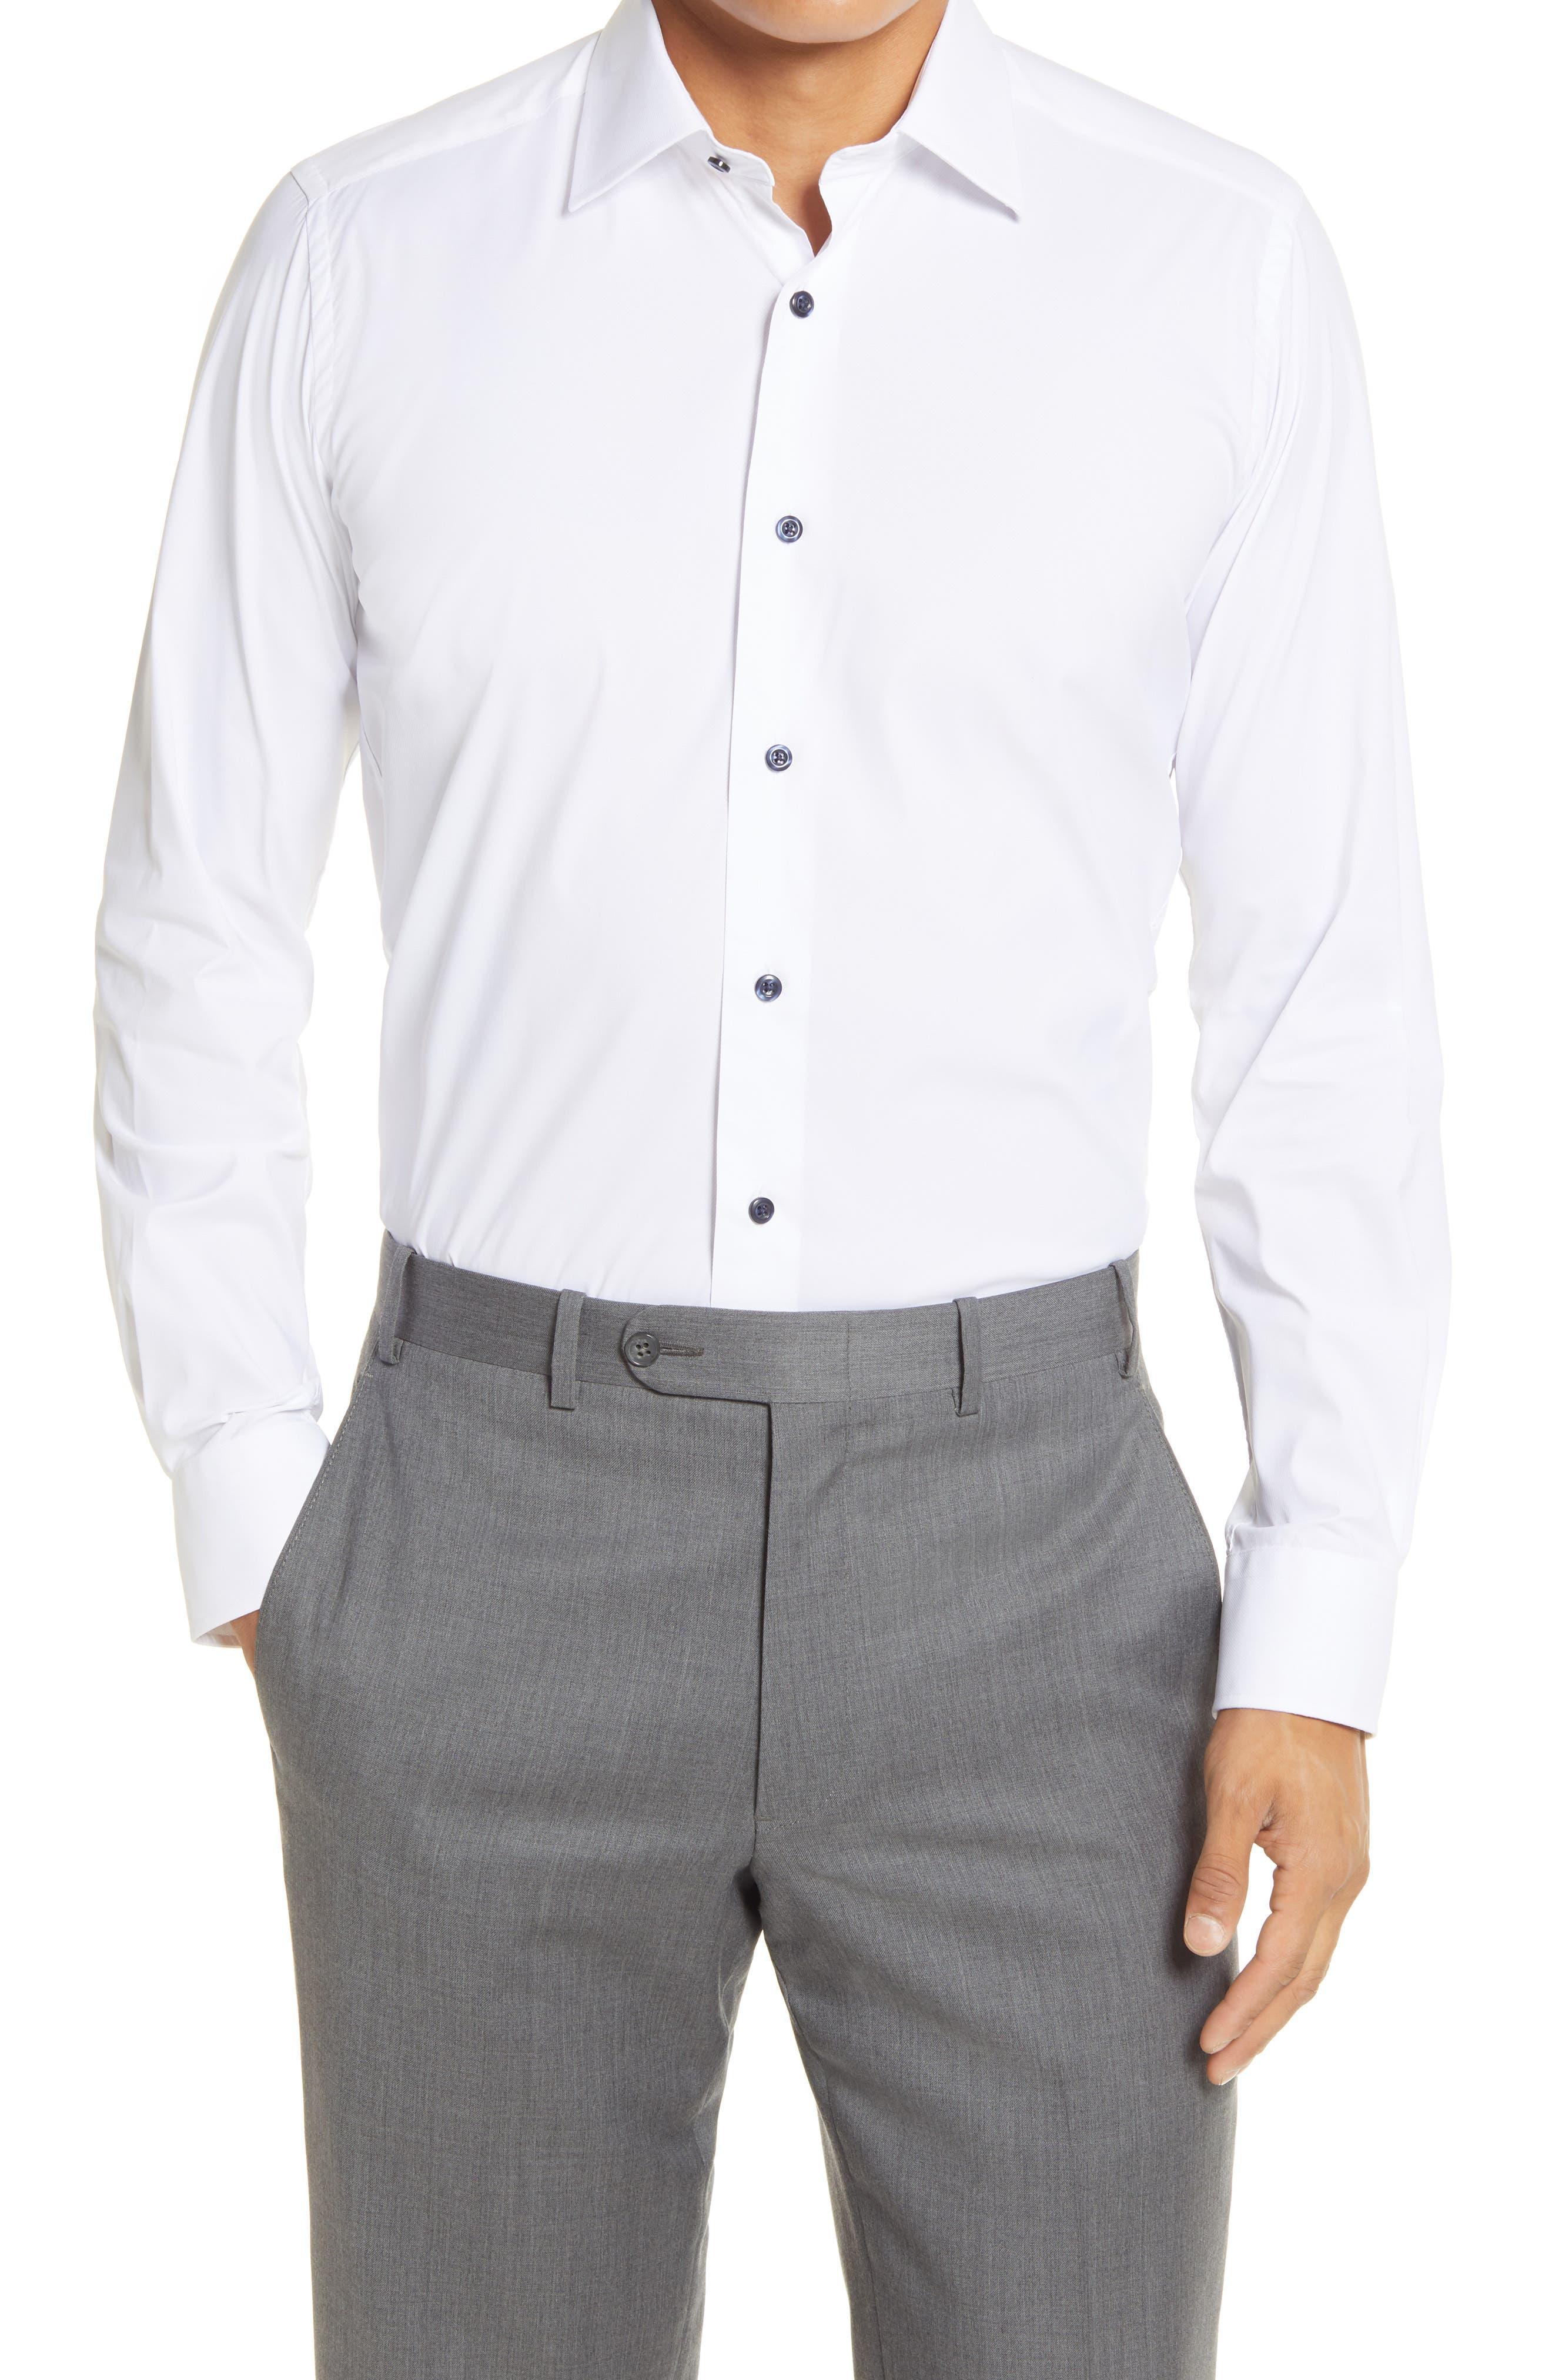 Trim Fit Solid White Performance Dress Shirt